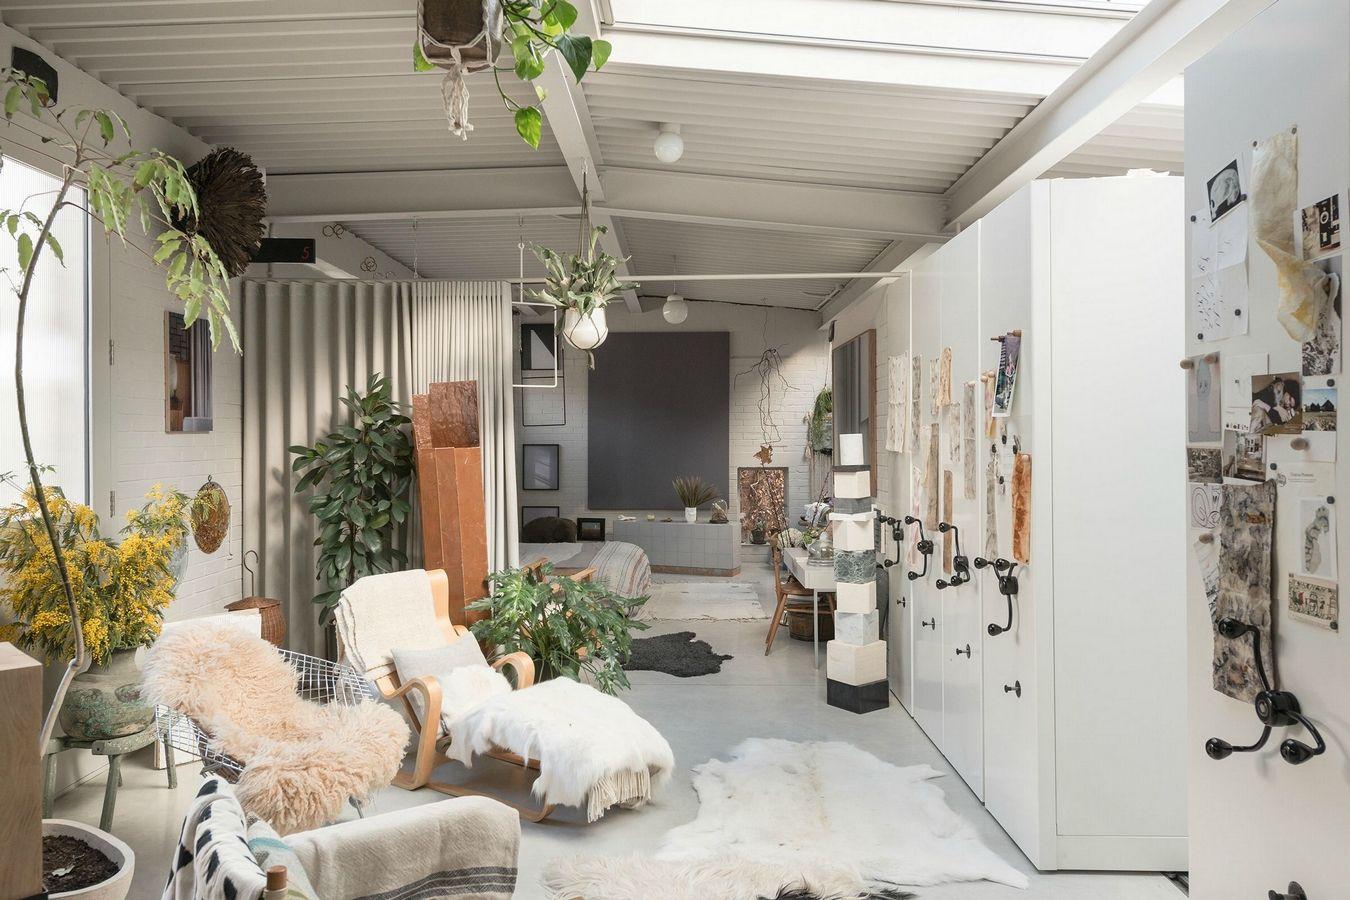 3 bedroom house interior design  bedroom detached house for sale in islington n london